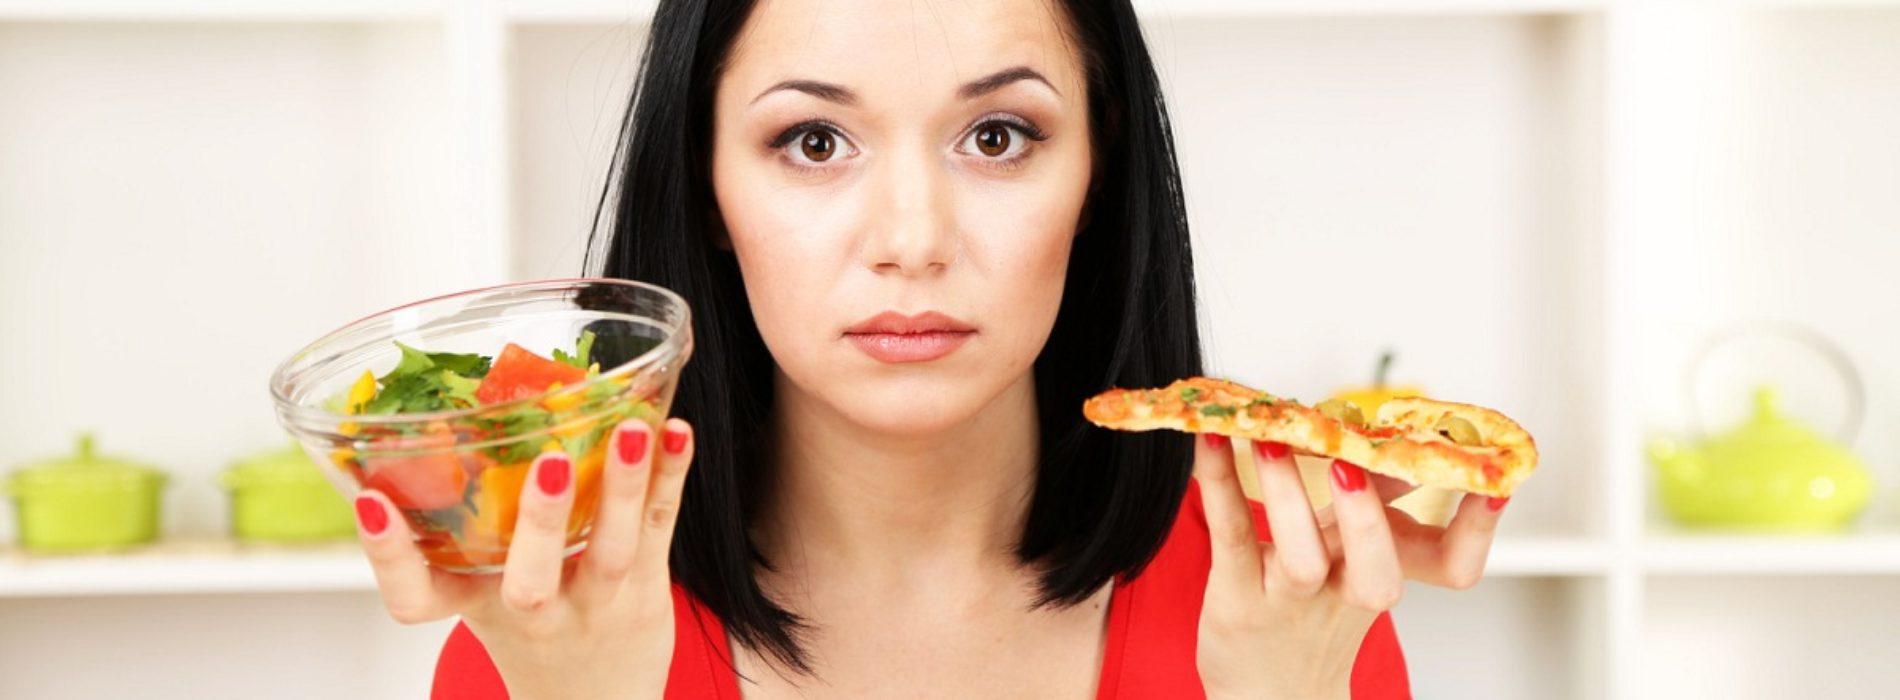 Proponents of The Paleo Diet Have Always Been Winning the Debate